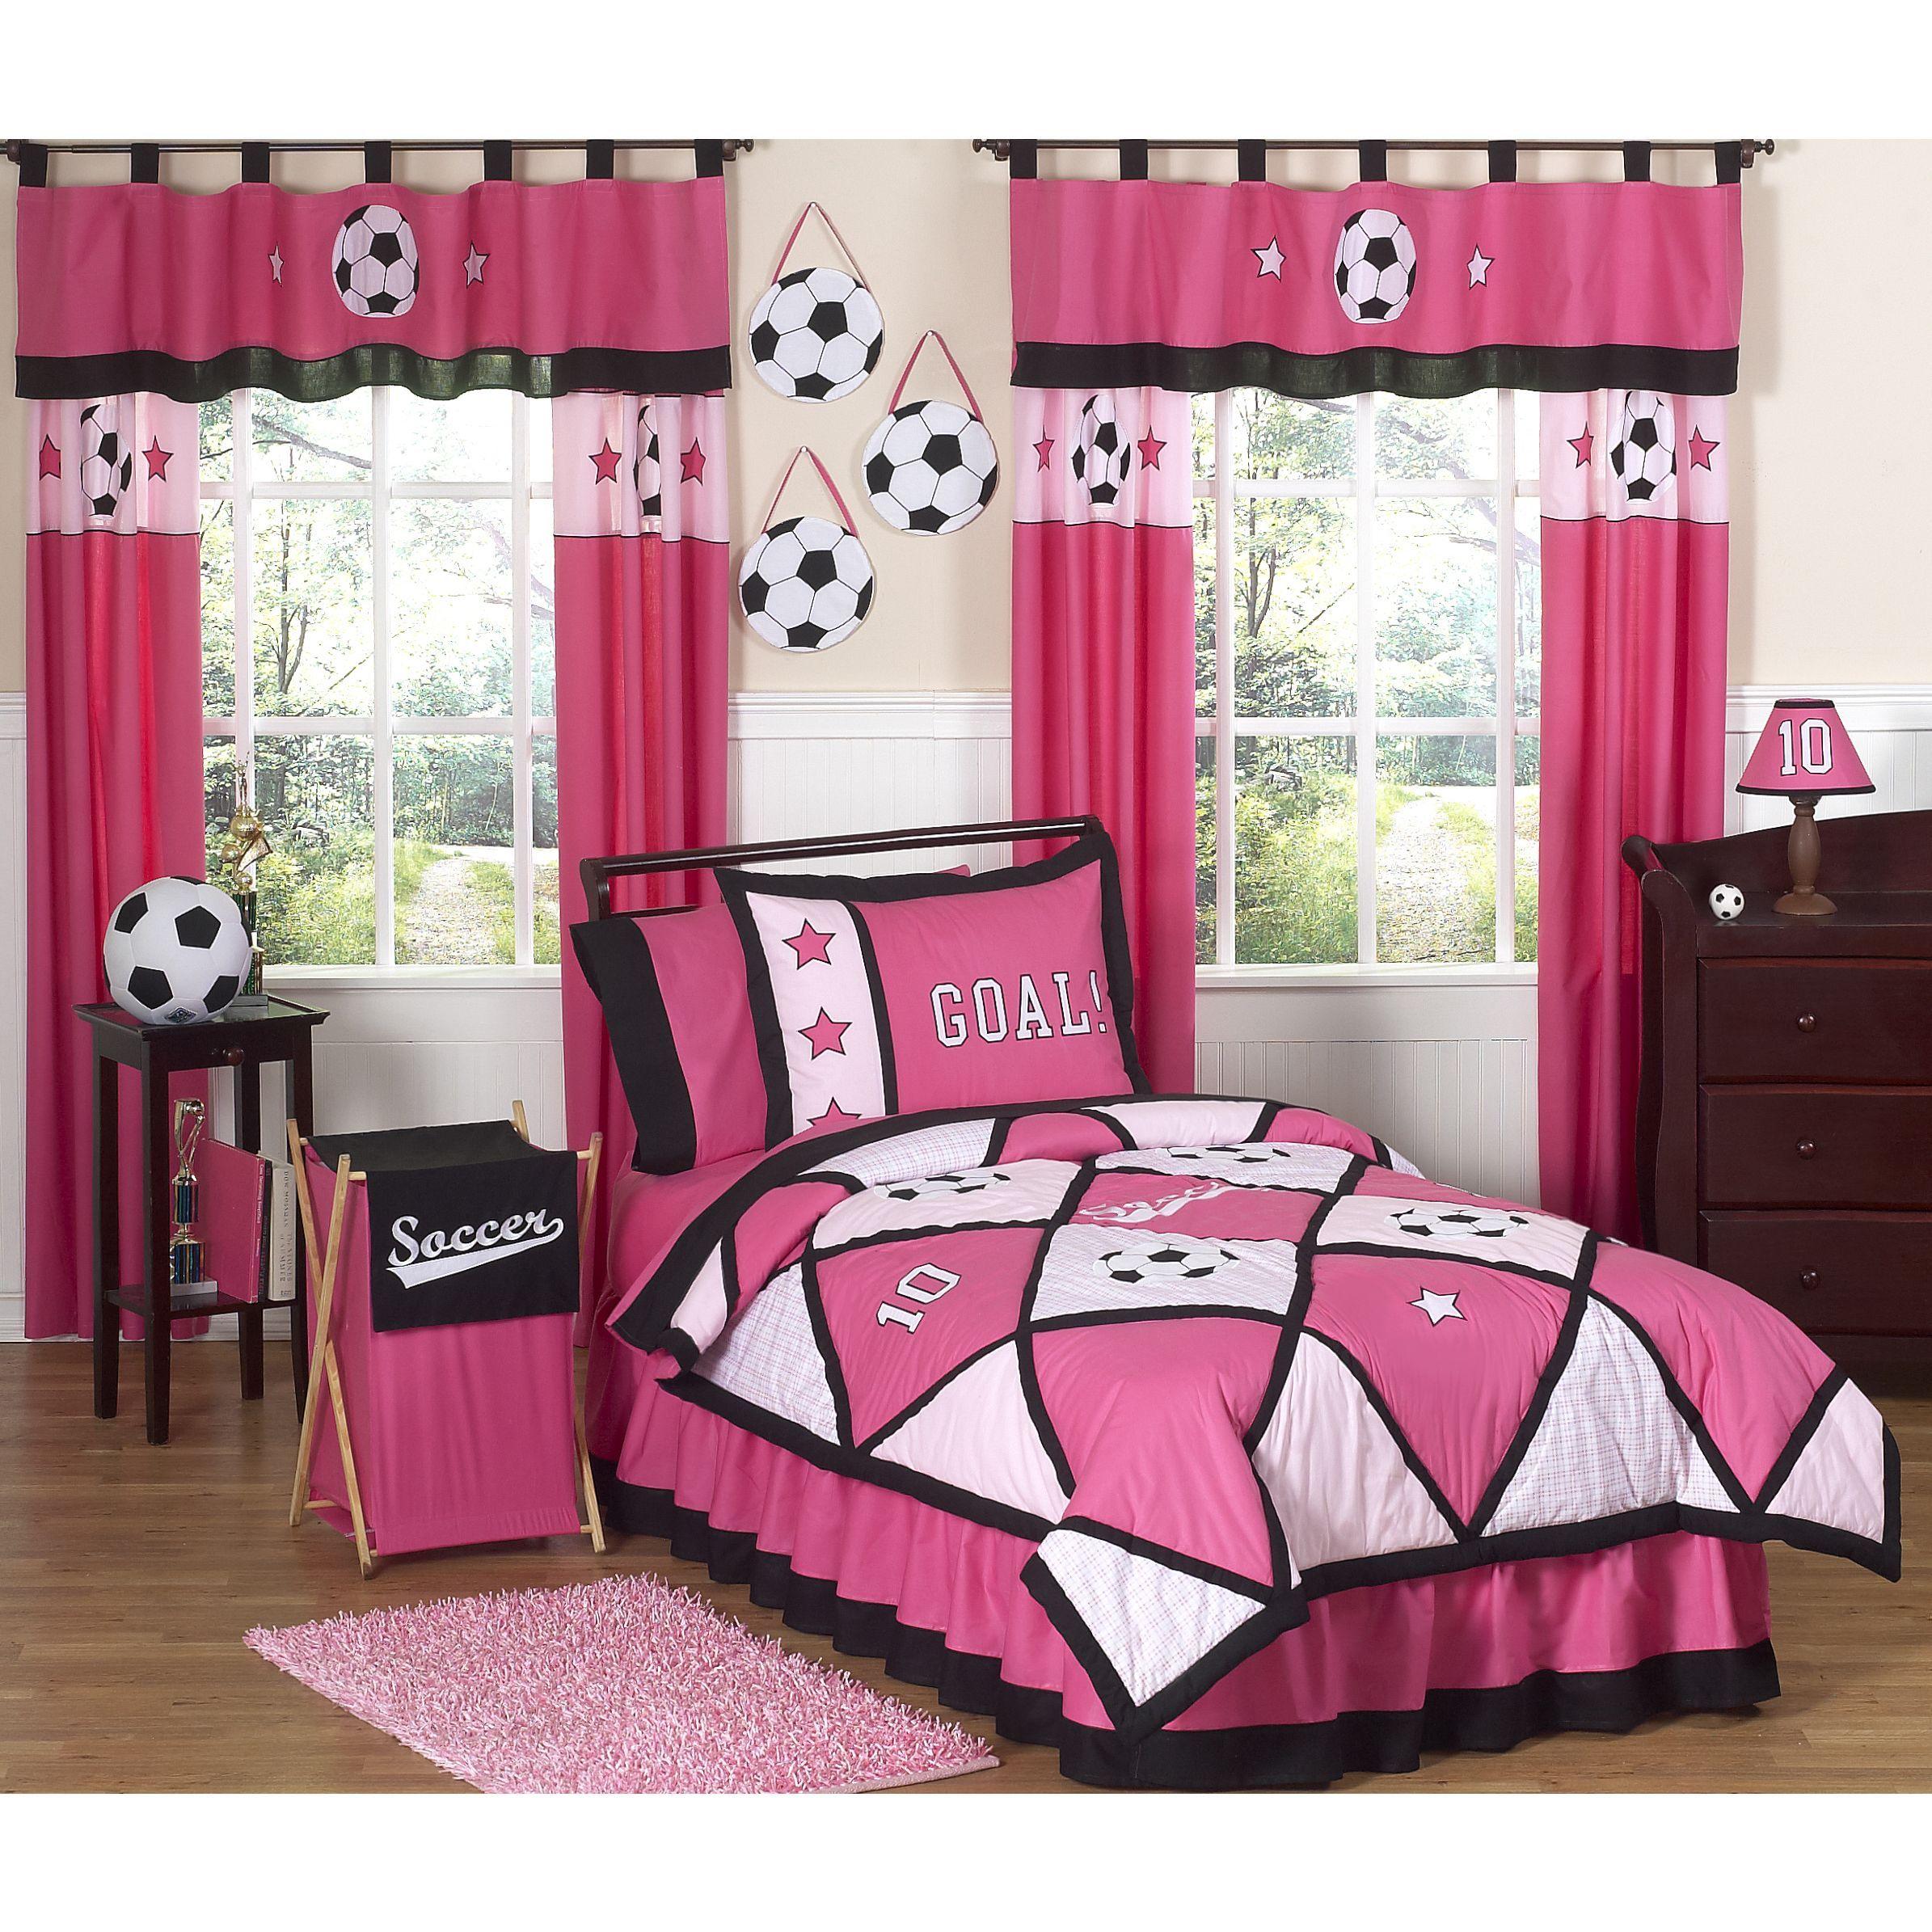 bedding p blue twin all comforter images additional bsm boys little soccer set for sportsman sports star bed